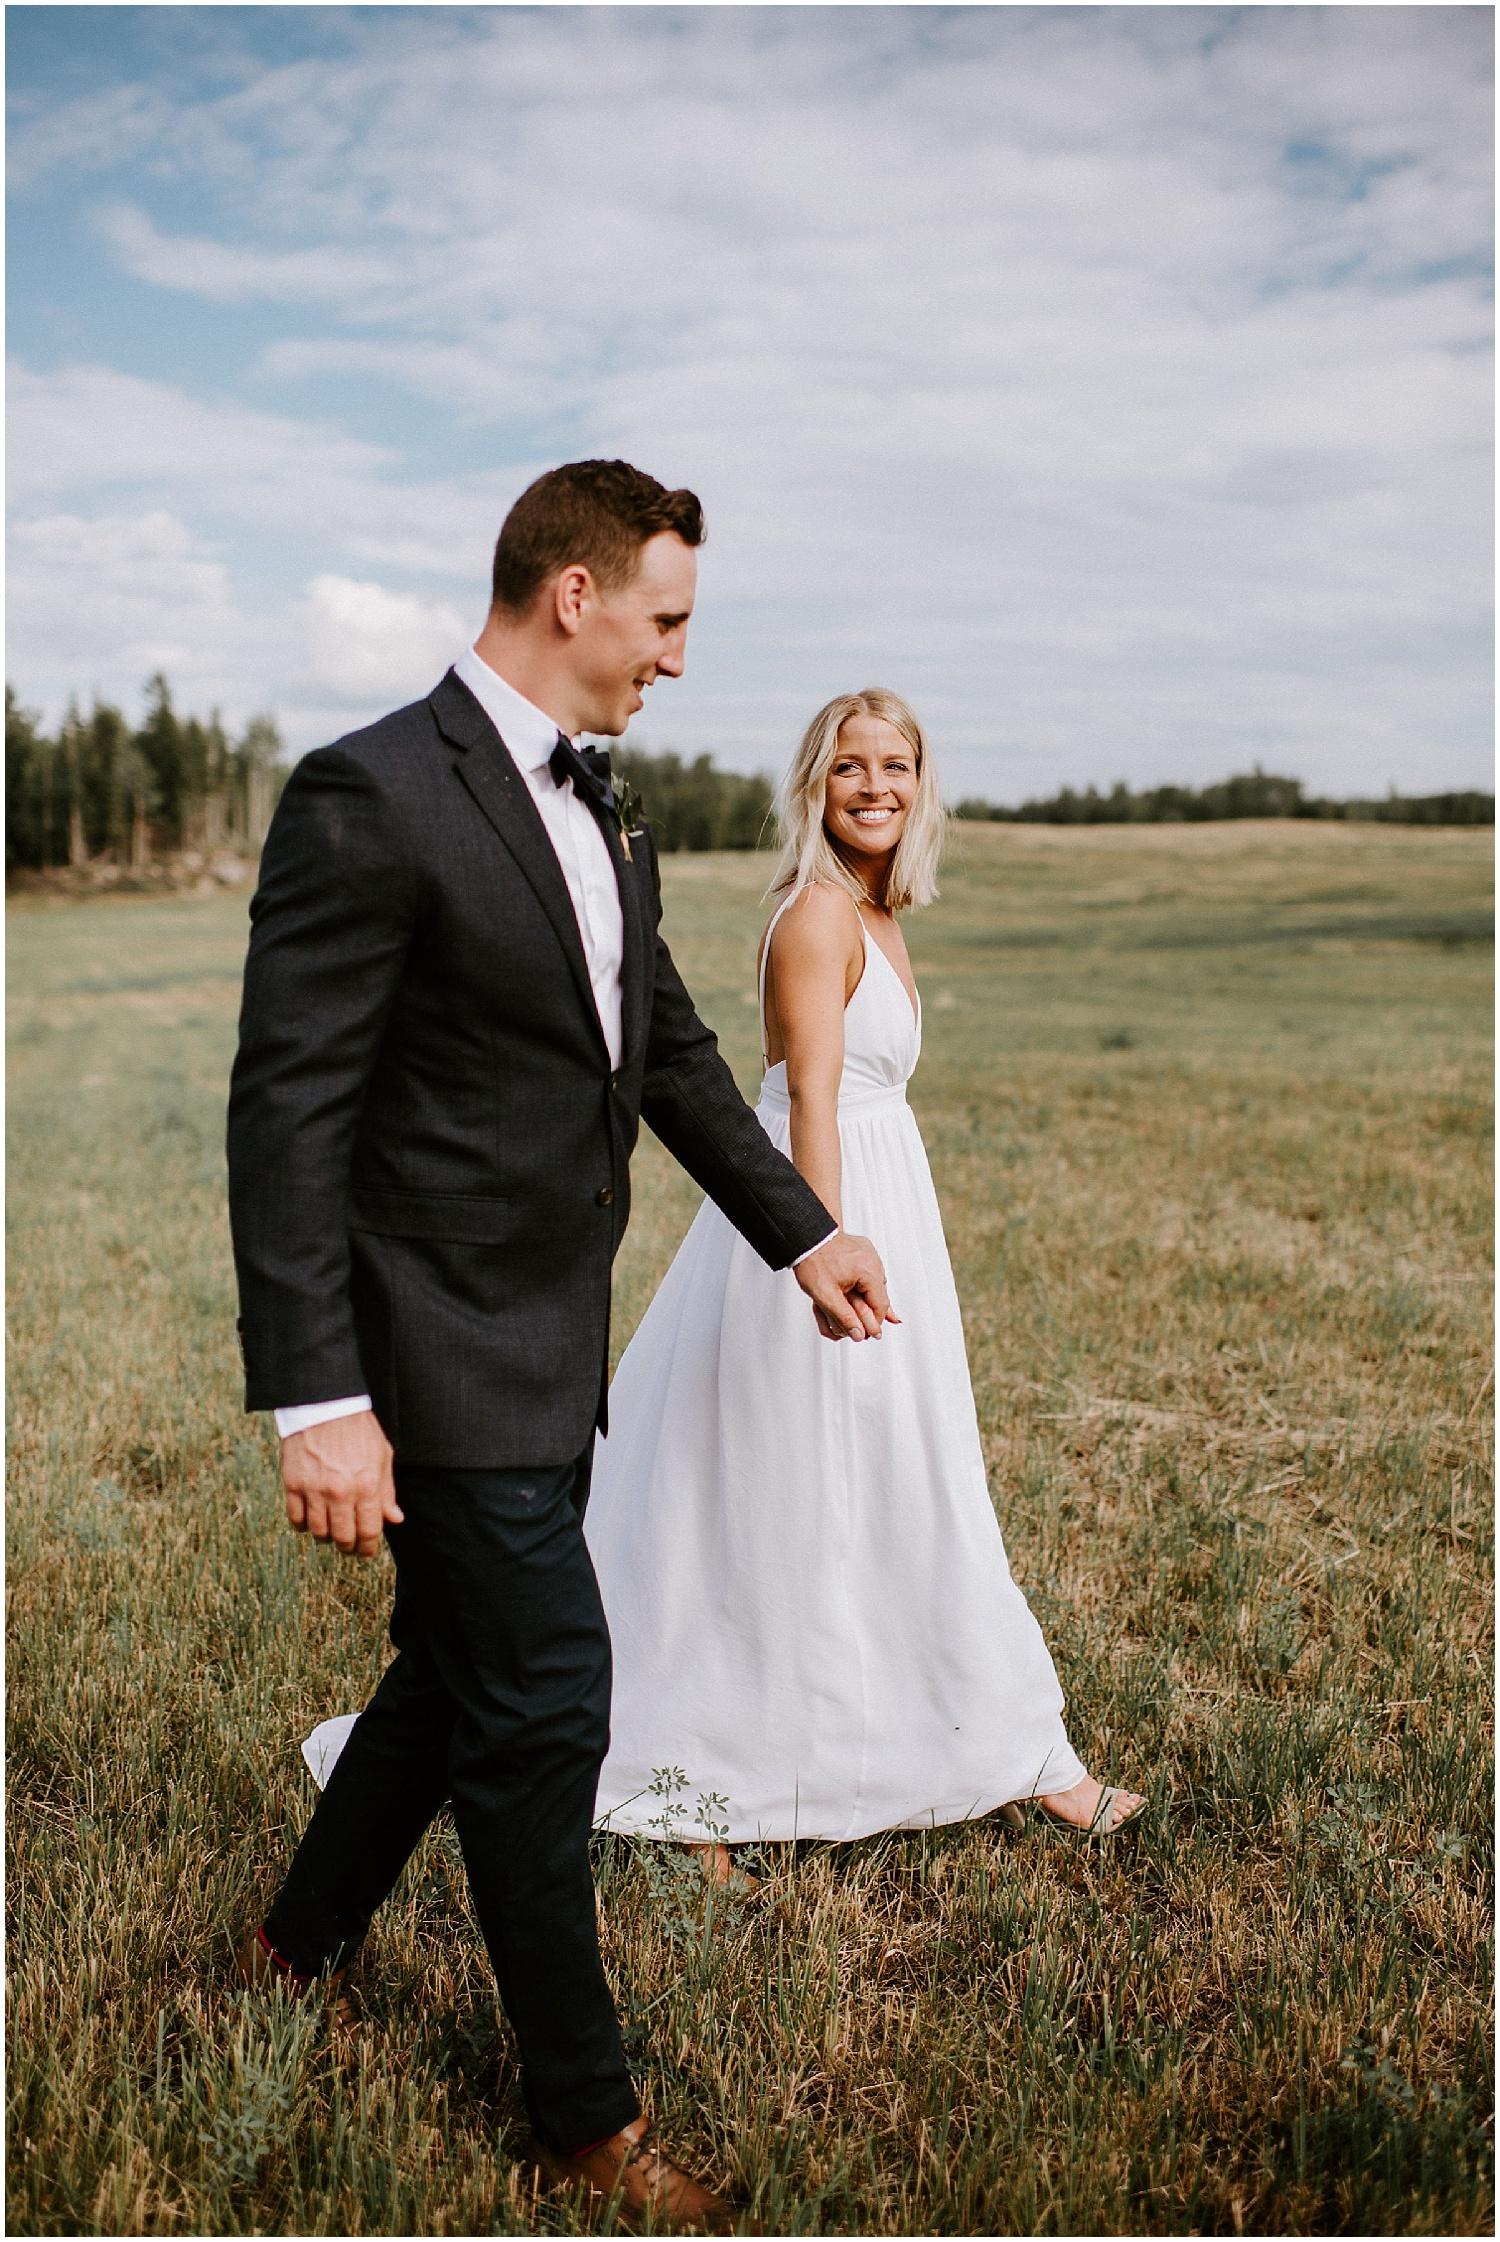 Quesnel_wedding_vancouver_bc_elopement_Pinnacles_Provincial_Park_0226.jpg